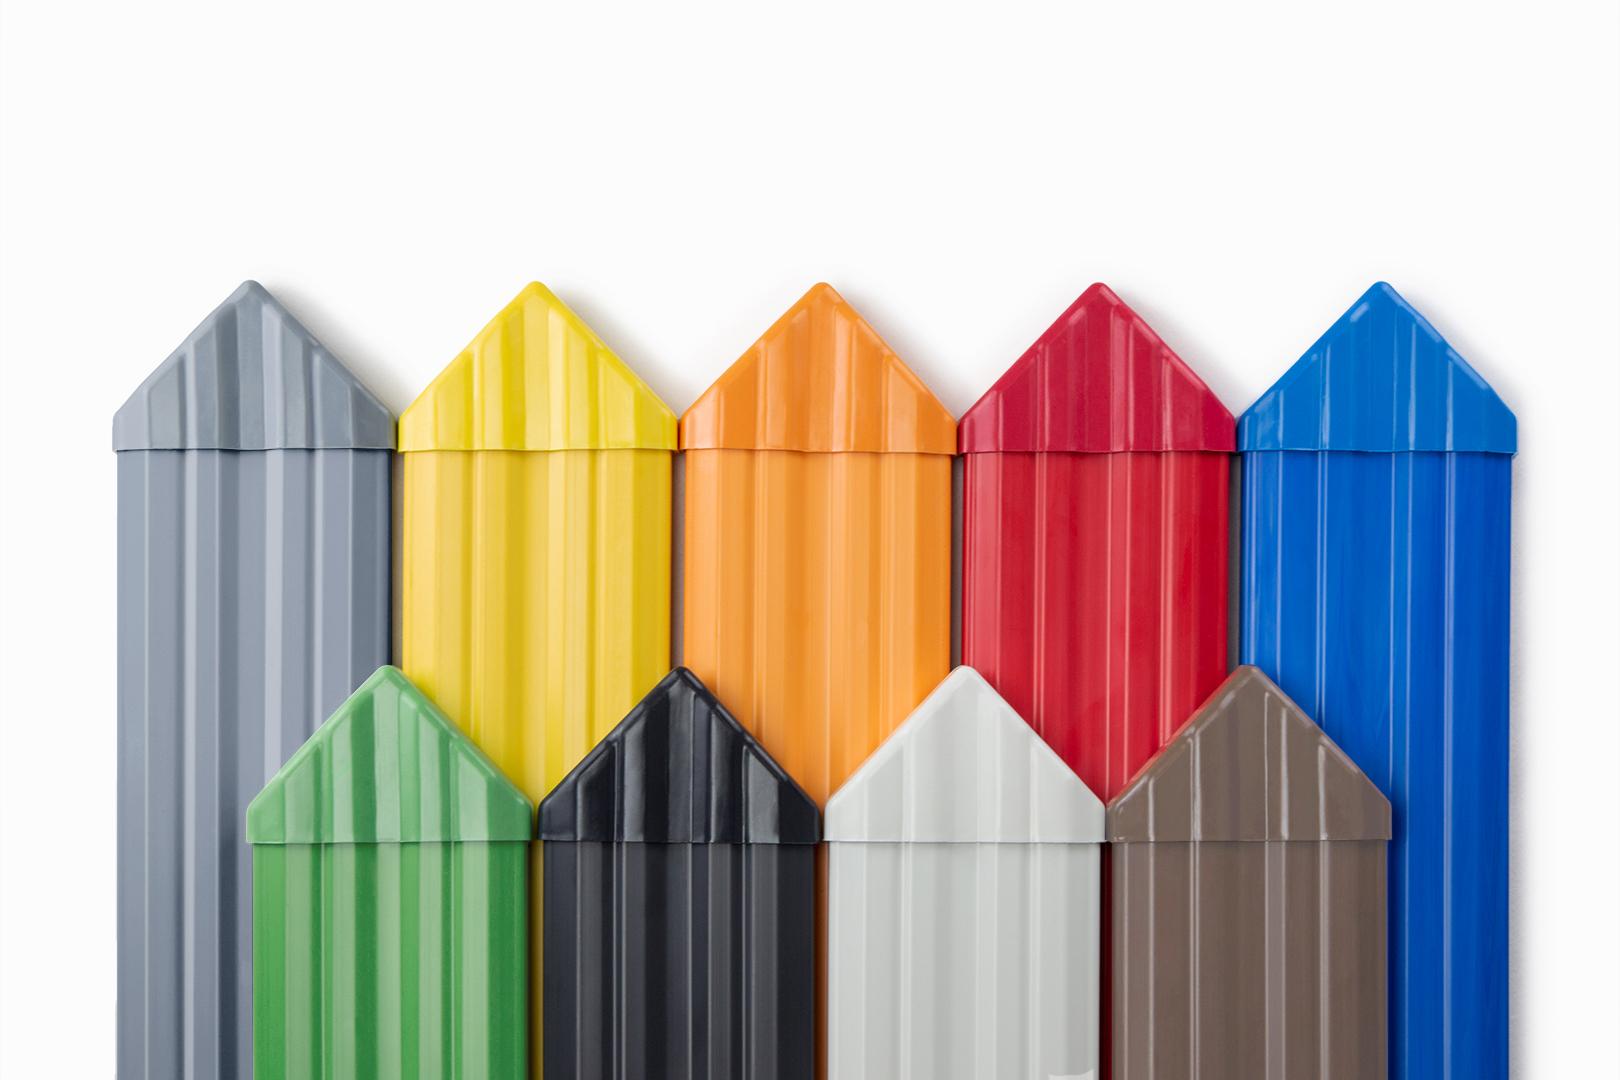 Zaunkappen spitz - PVC - Gartenzaun, Balkonbrett, viele Farben PZKS